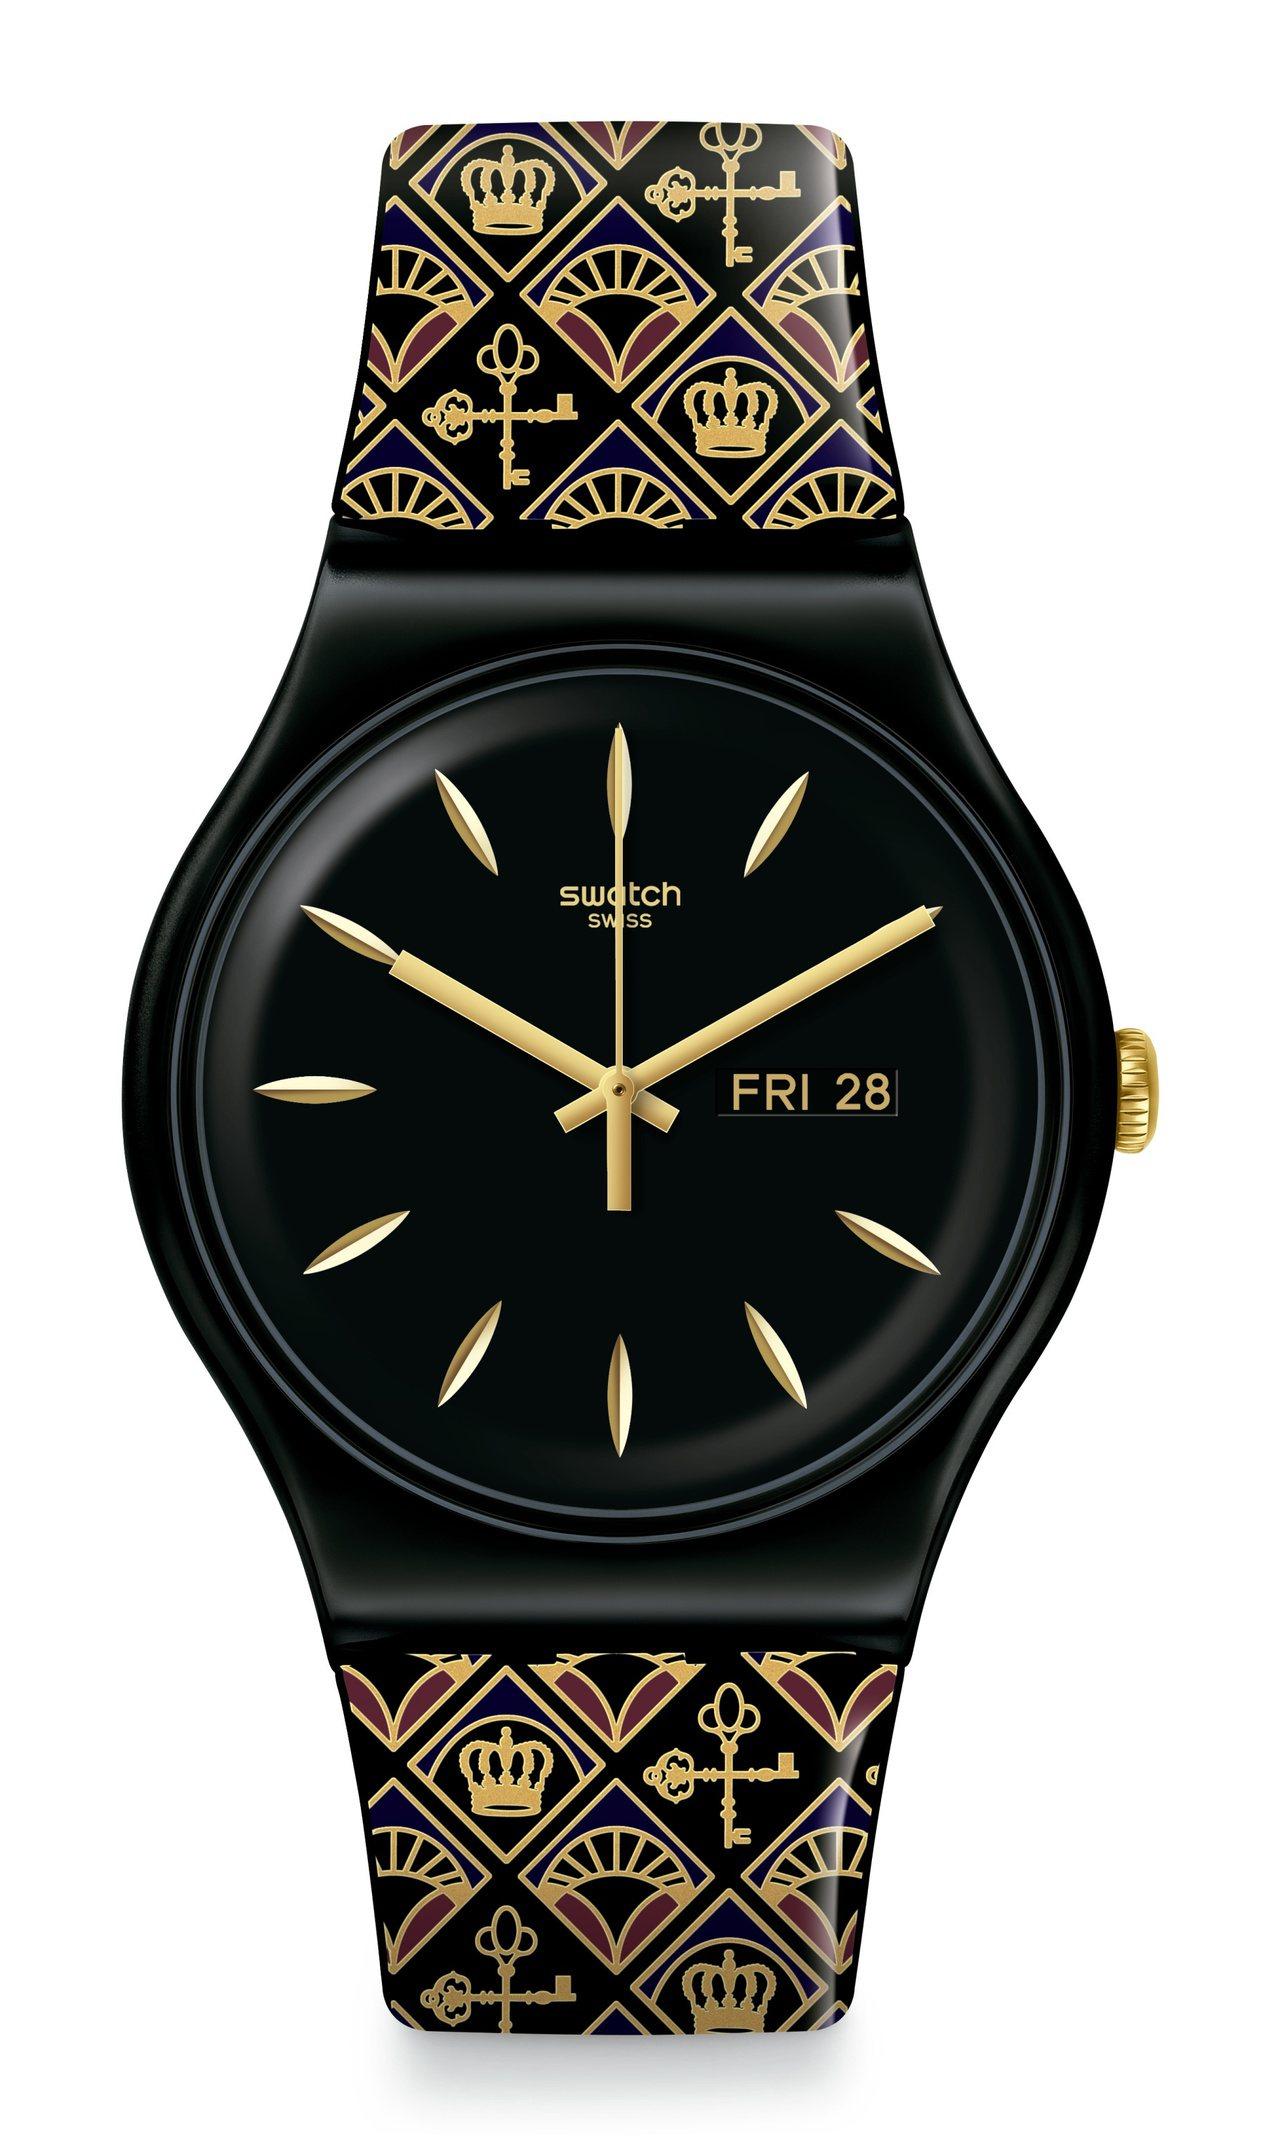 SWATCH ROYAL KEY皇家之鑰腕表,2,350元。圖/SWATCH提供